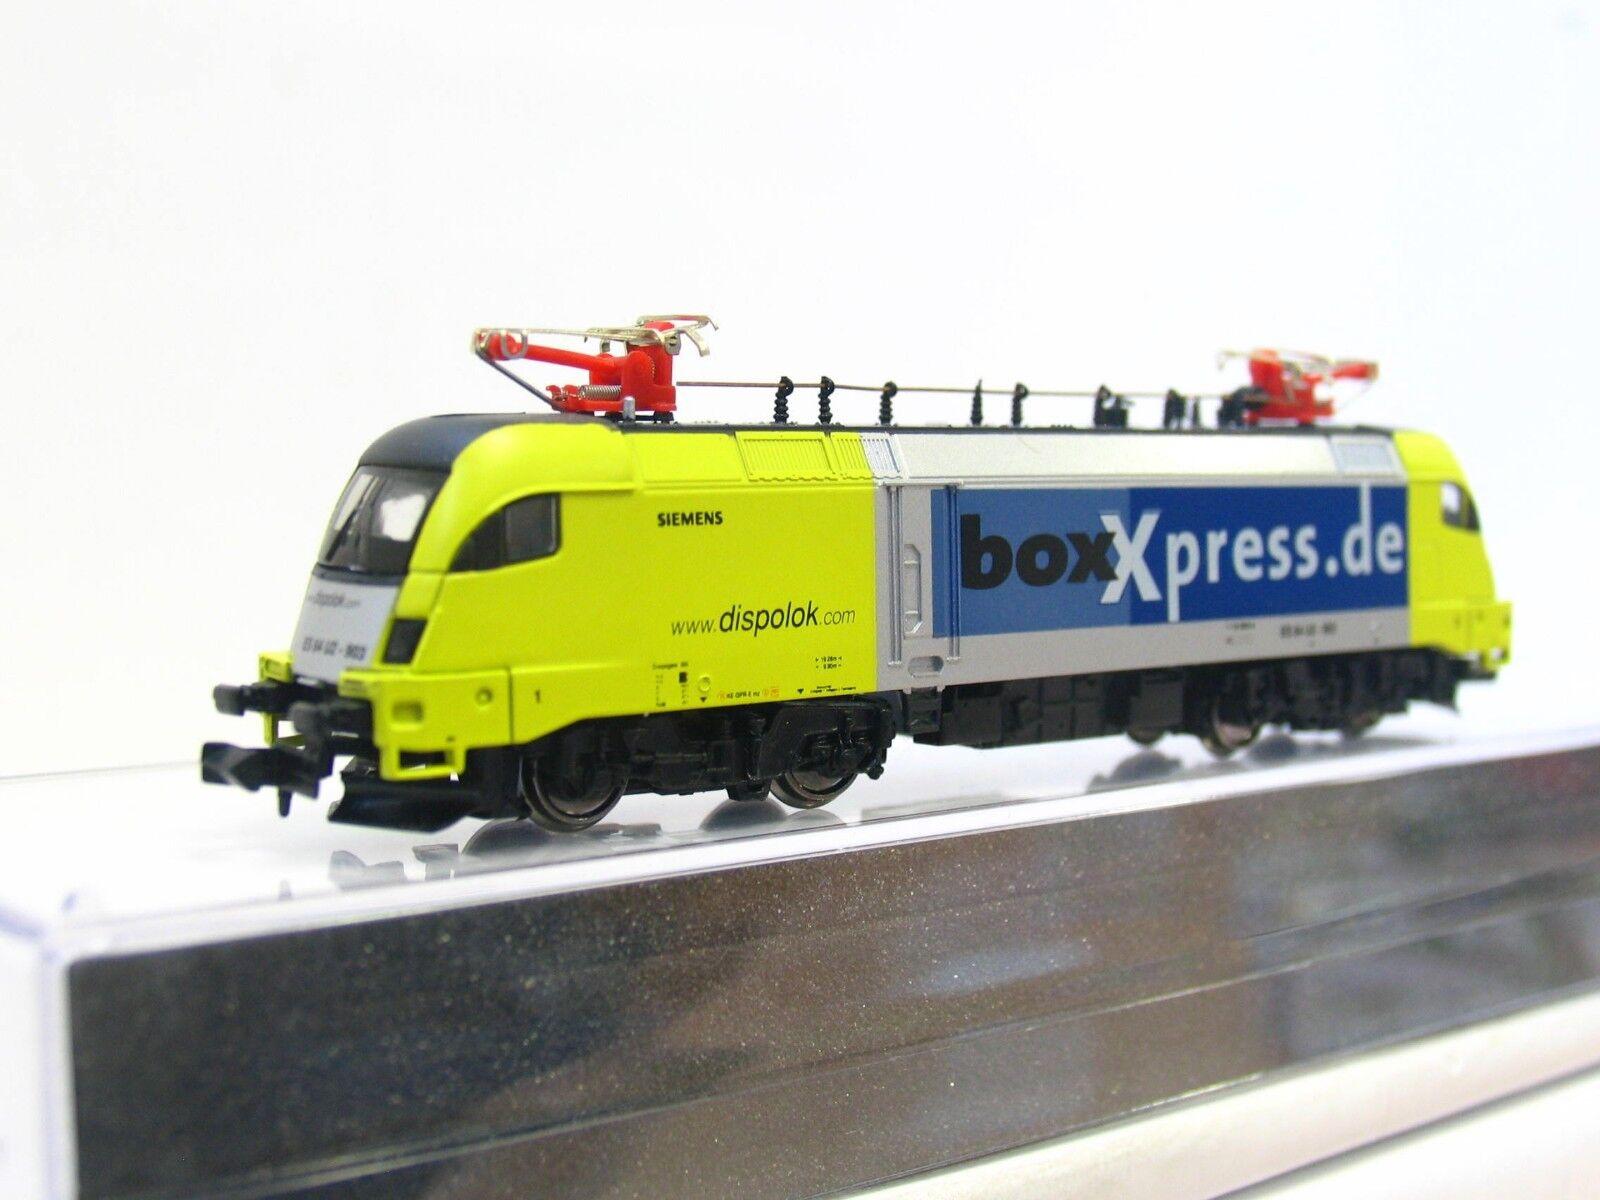 Hobbytrain 219675 E-Lok es 64 u2 - 903 Dispolok boxpress. de OVP  rb917